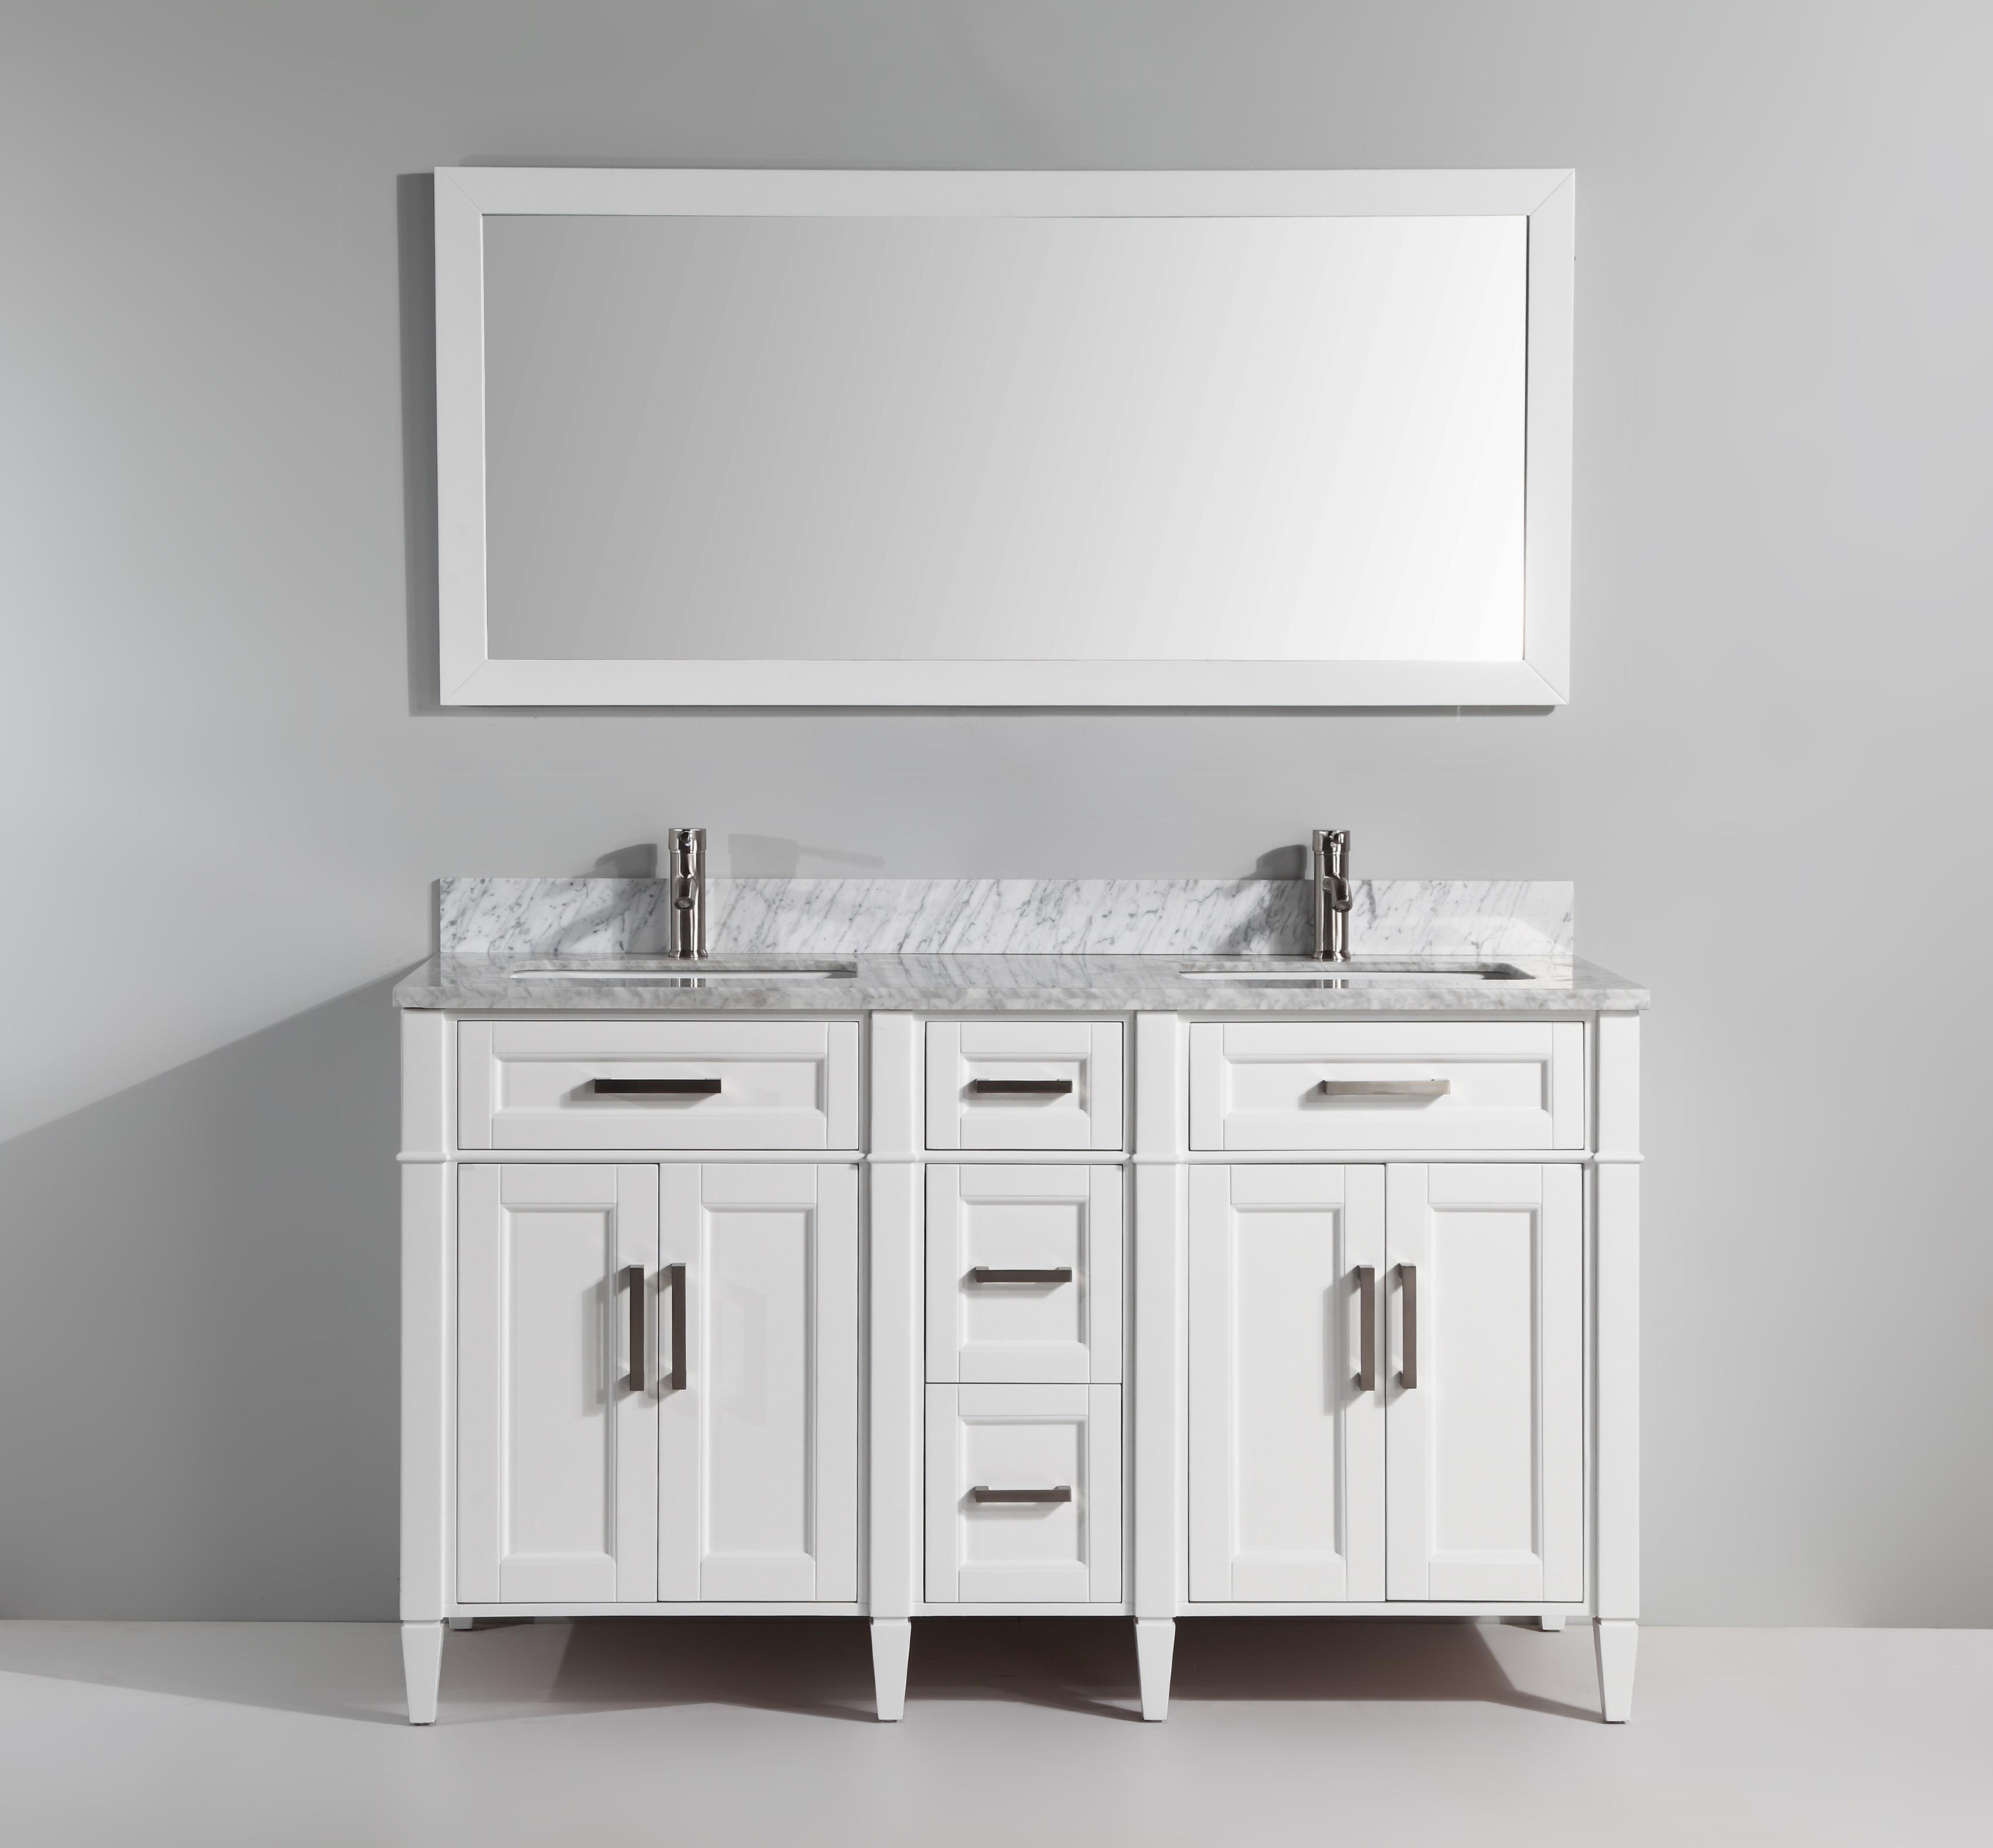 Vanity Art 60 Inch Double Sink Bathroom Vanity Set With Carrara